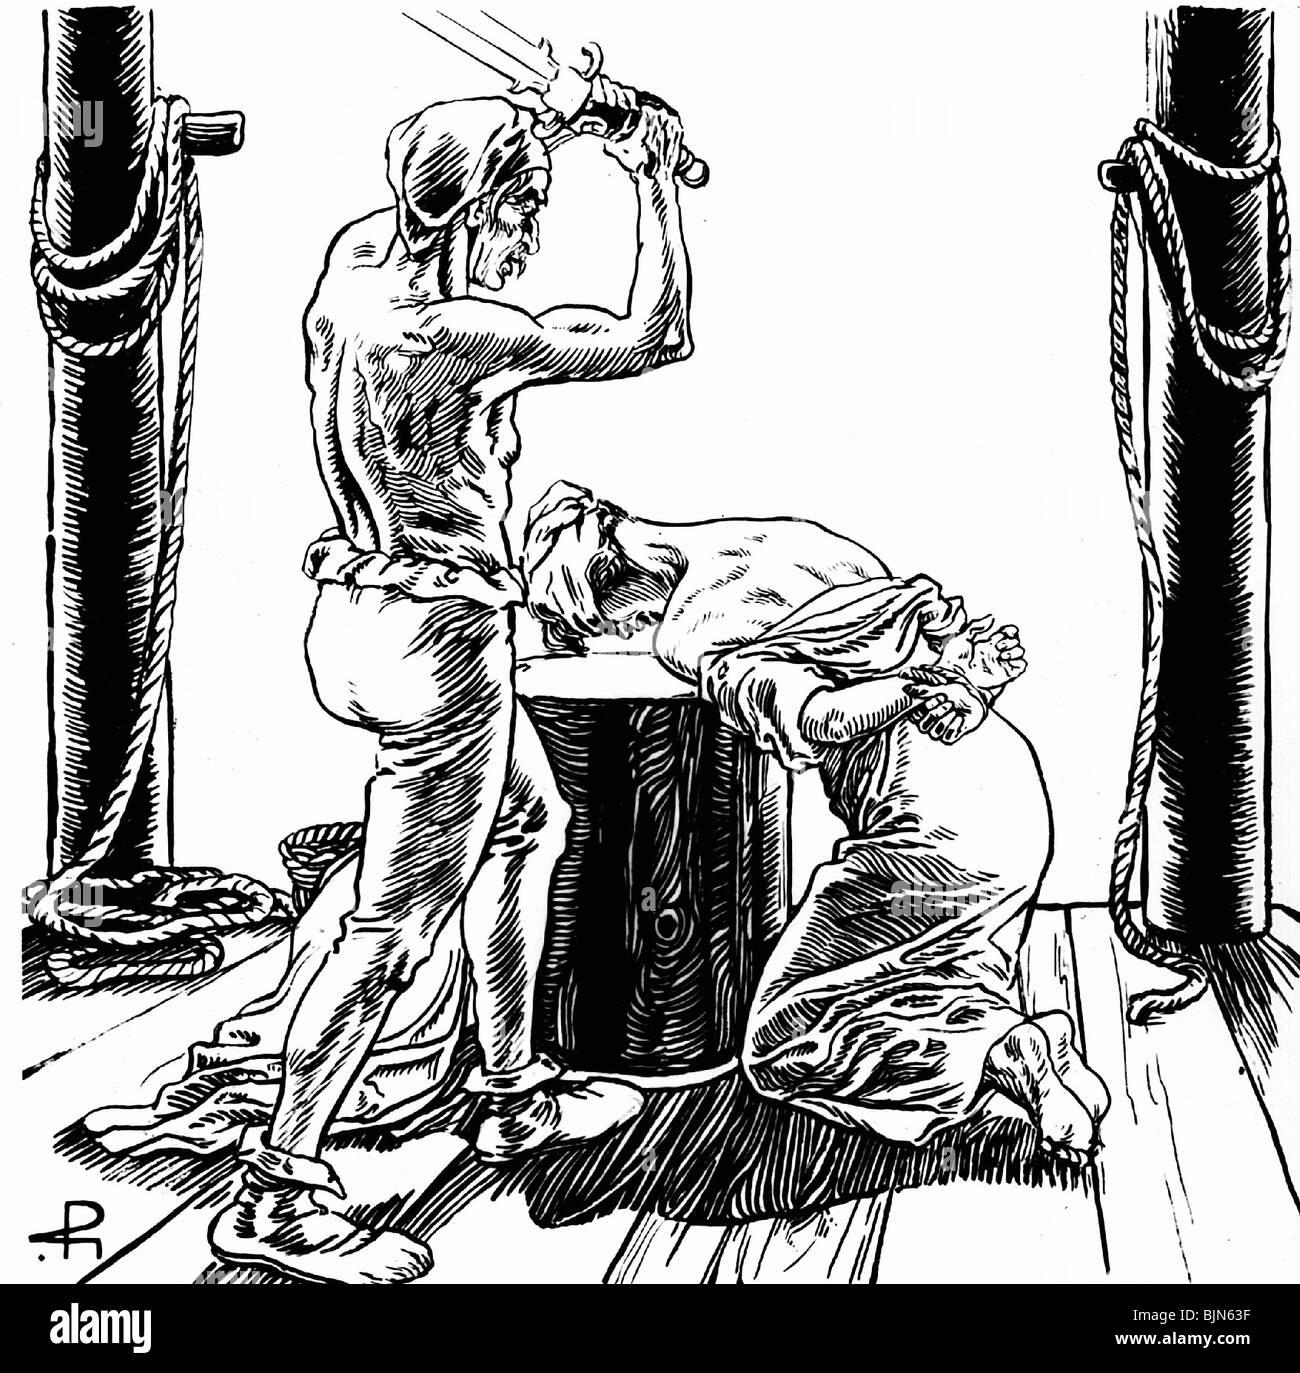 Erotic death penalty illustrations